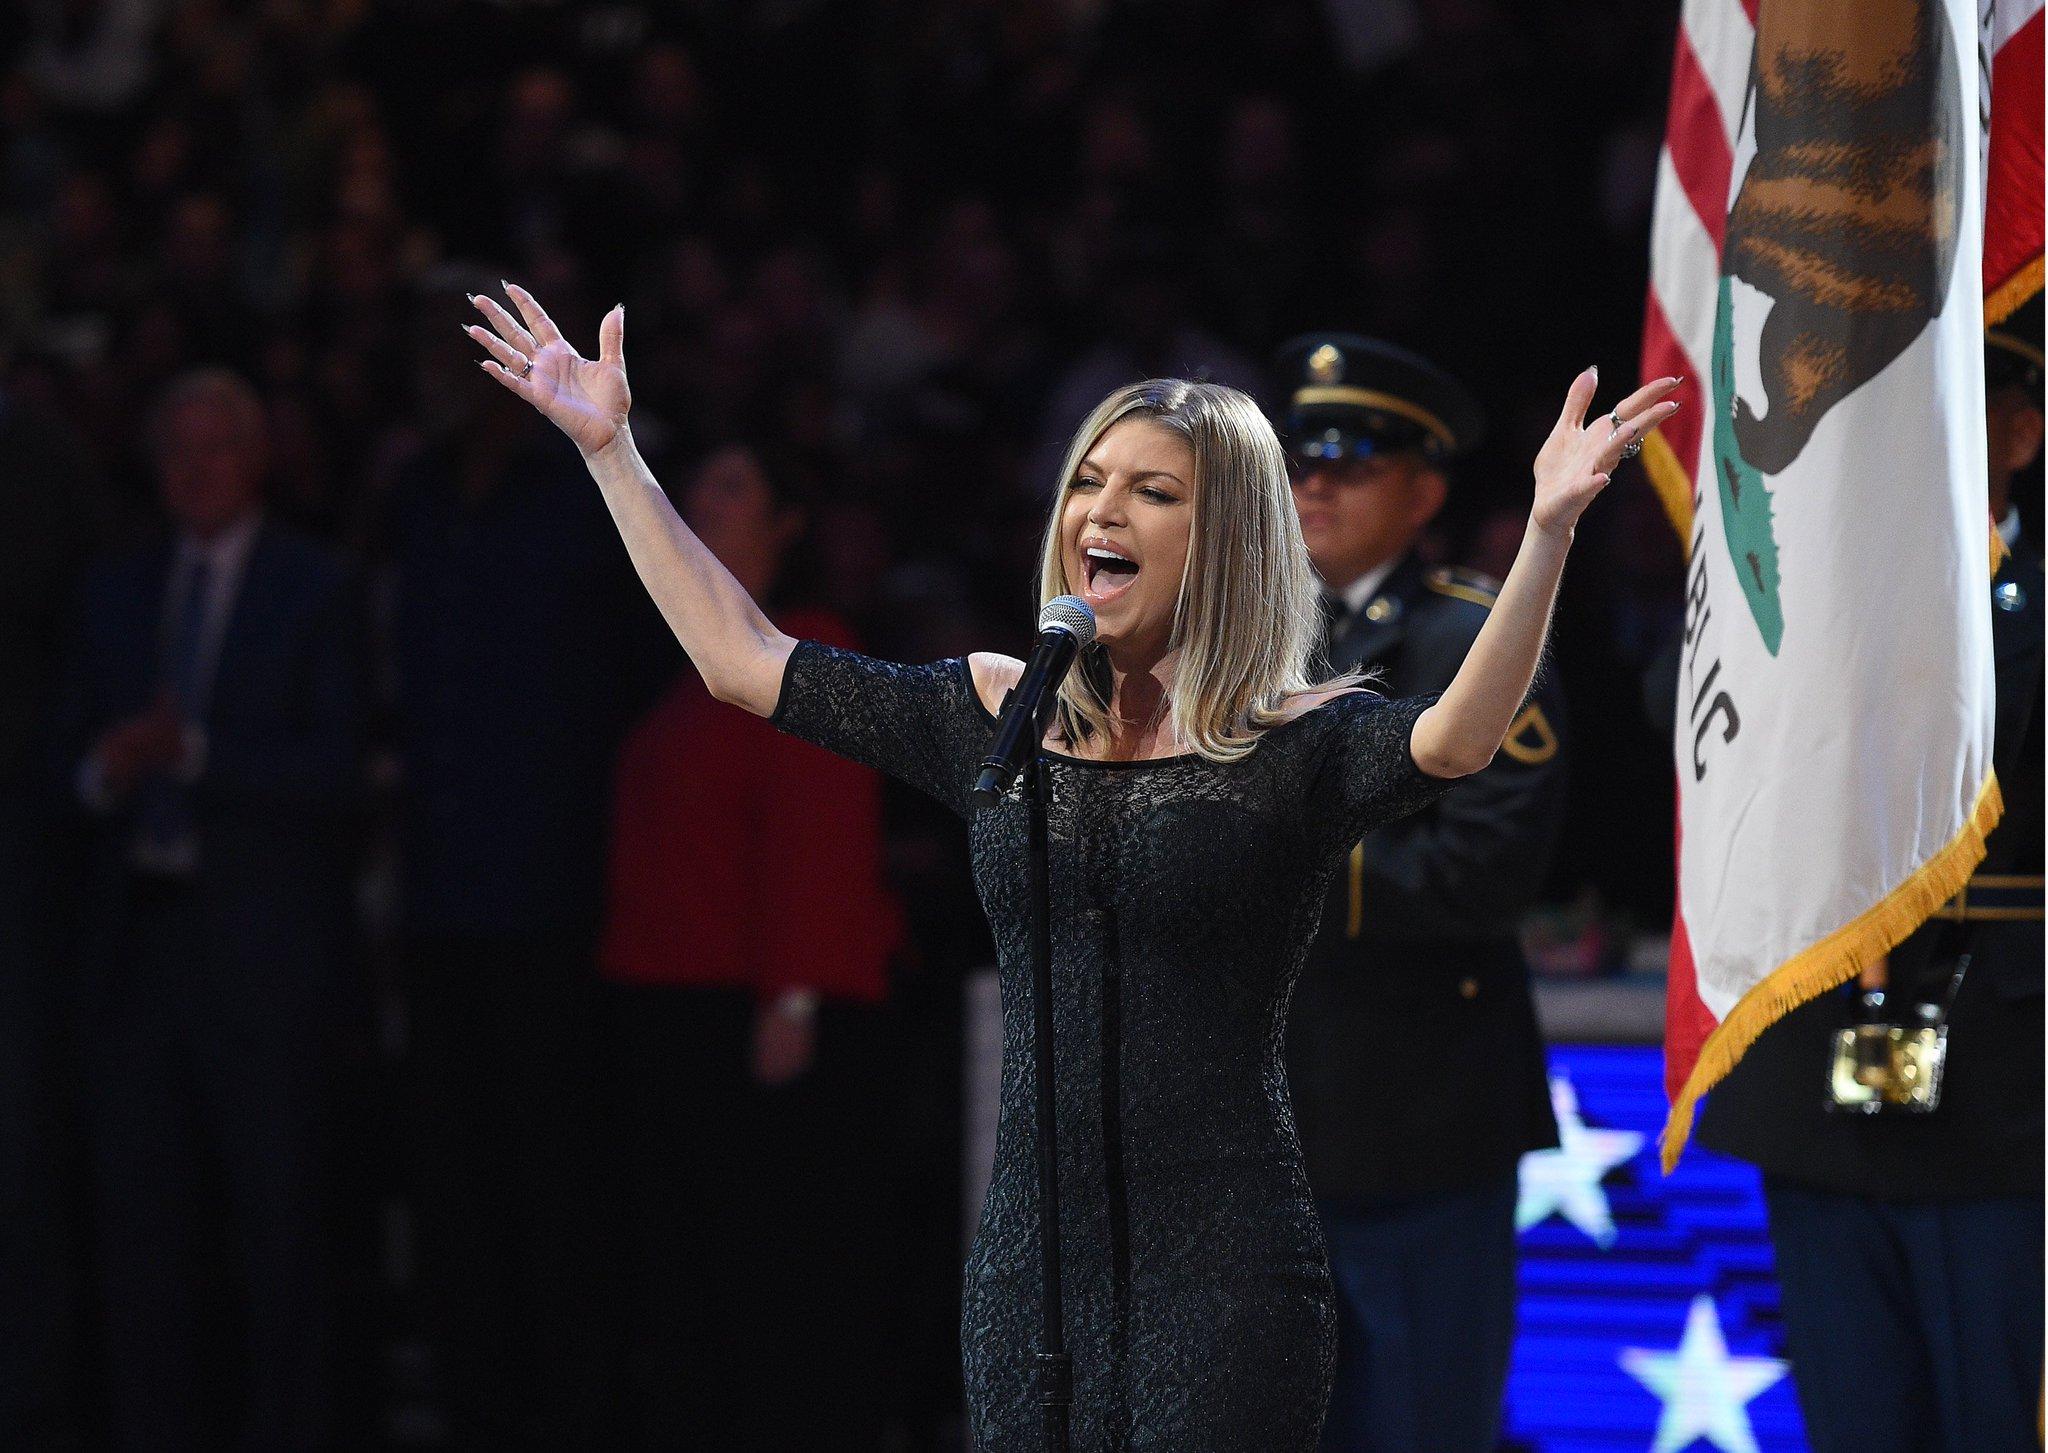 Fergie responds to criticism following National Anthem rendition. https://t.co/8e9Gtc0uru https://t.co/ExTOj6F7VD